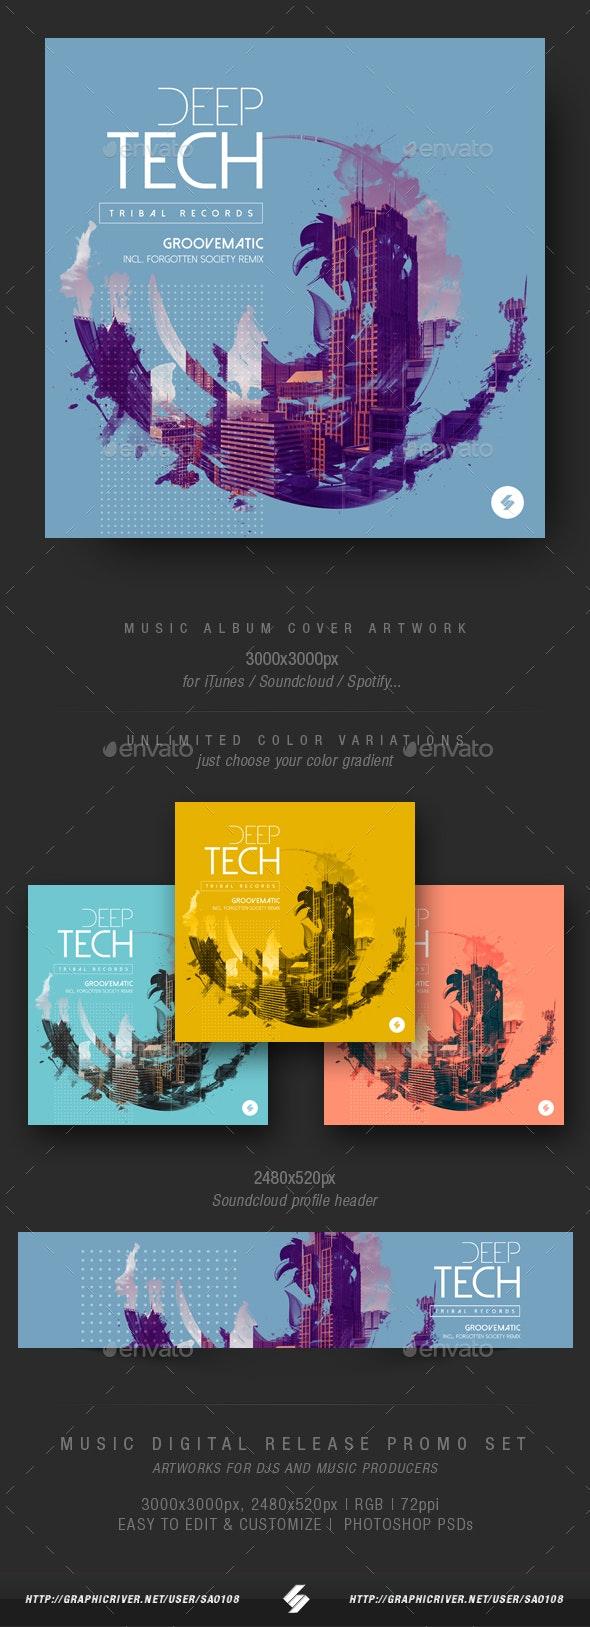 Deep Tech - Electronic Music Album Cover Artwork Template - Miscellaneous Social Media